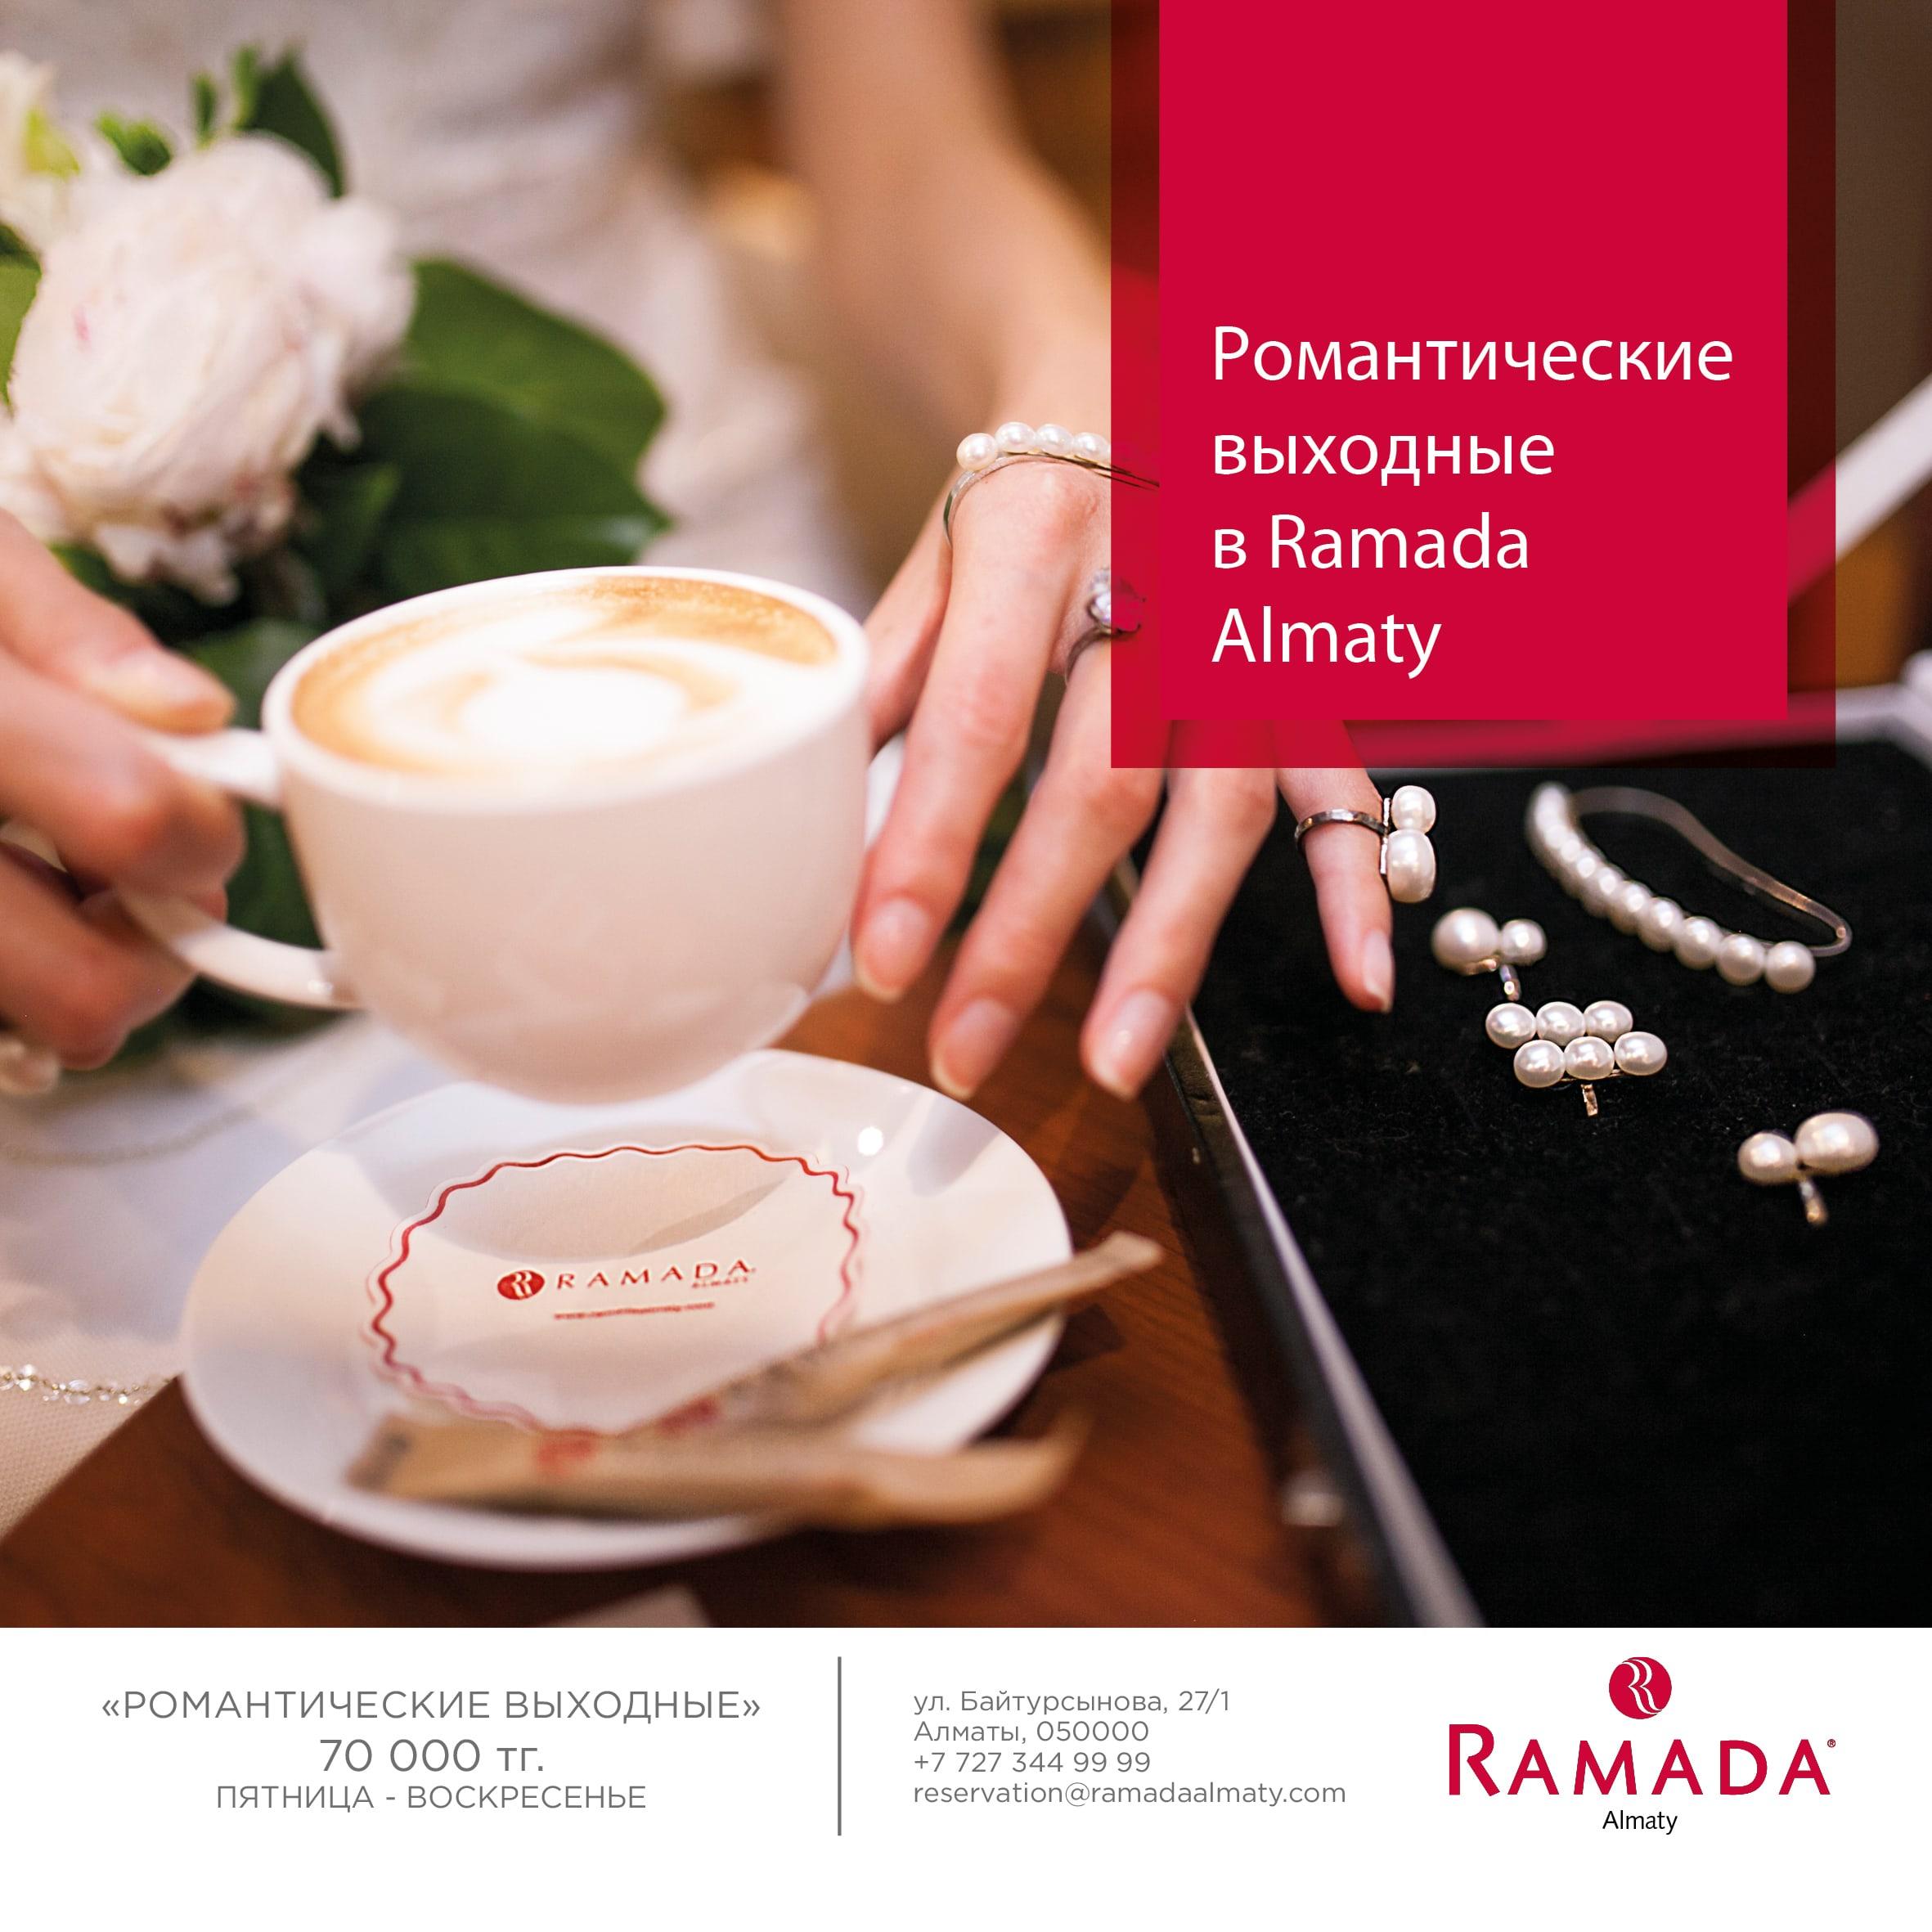 Ramada_post - 18-04-18 ru -2-min